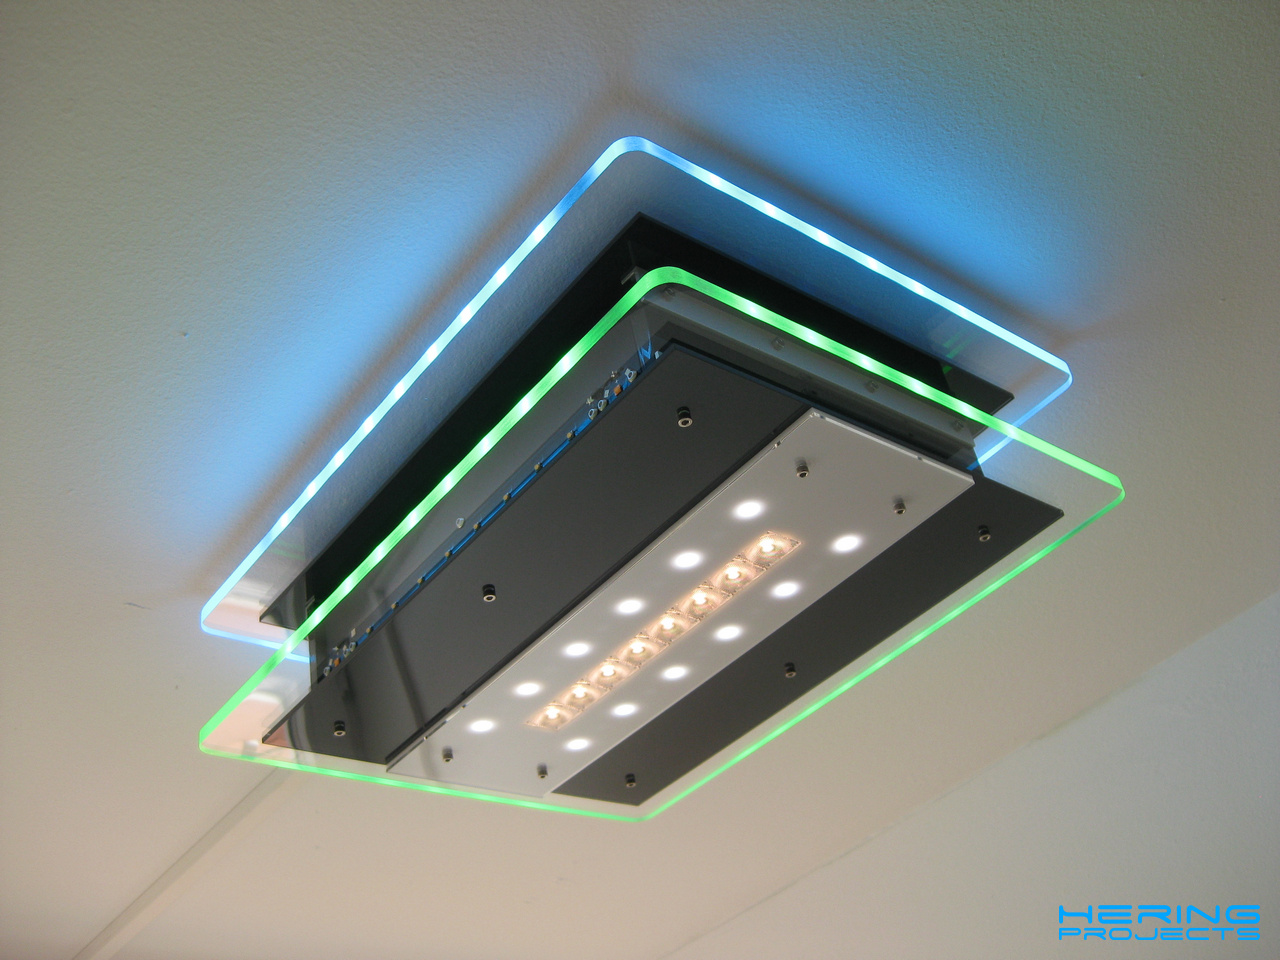 plexiglas led deckenlampe slim v2 0 seite 3 von 4 hering projects. Black Bedroom Furniture Sets. Home Design Ideas